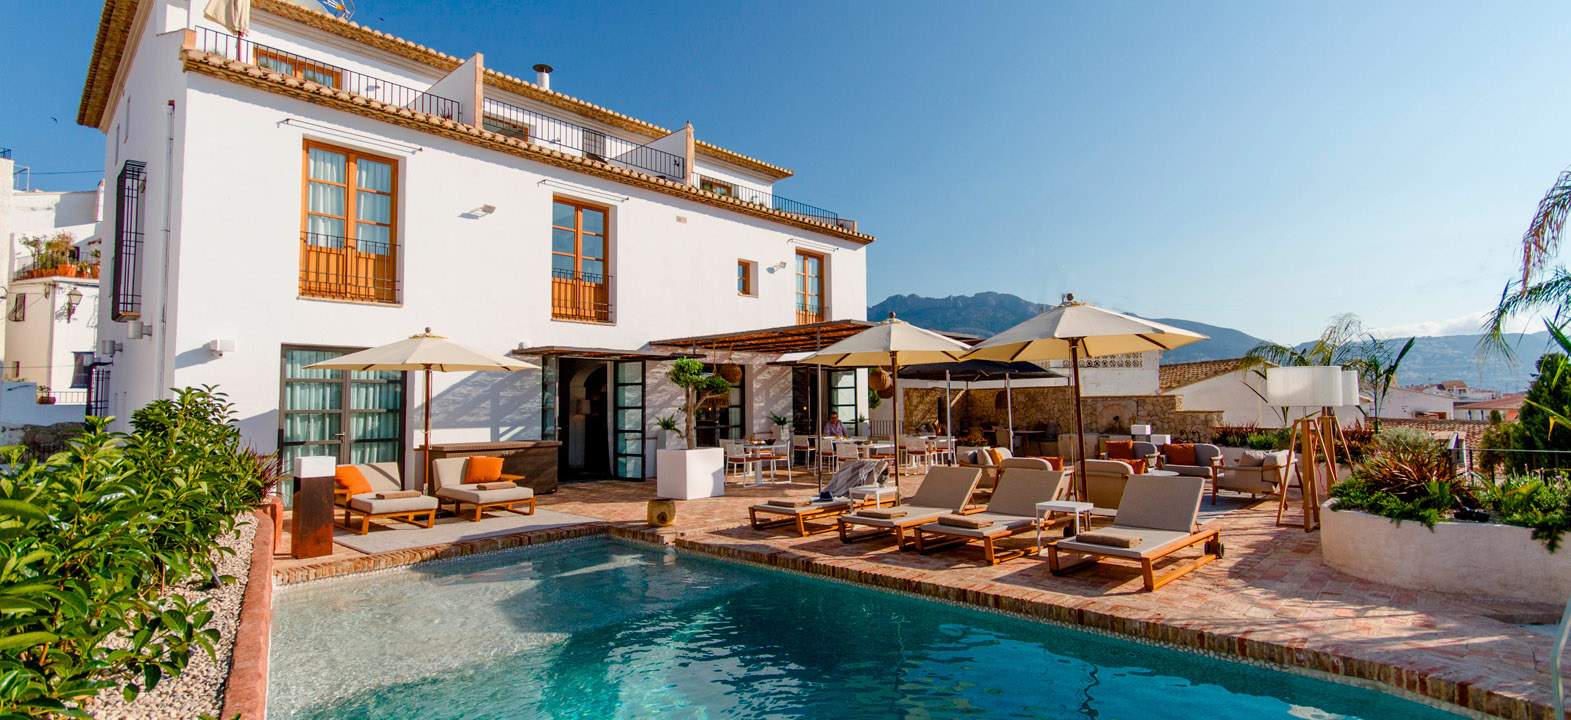 hotel la serena pool